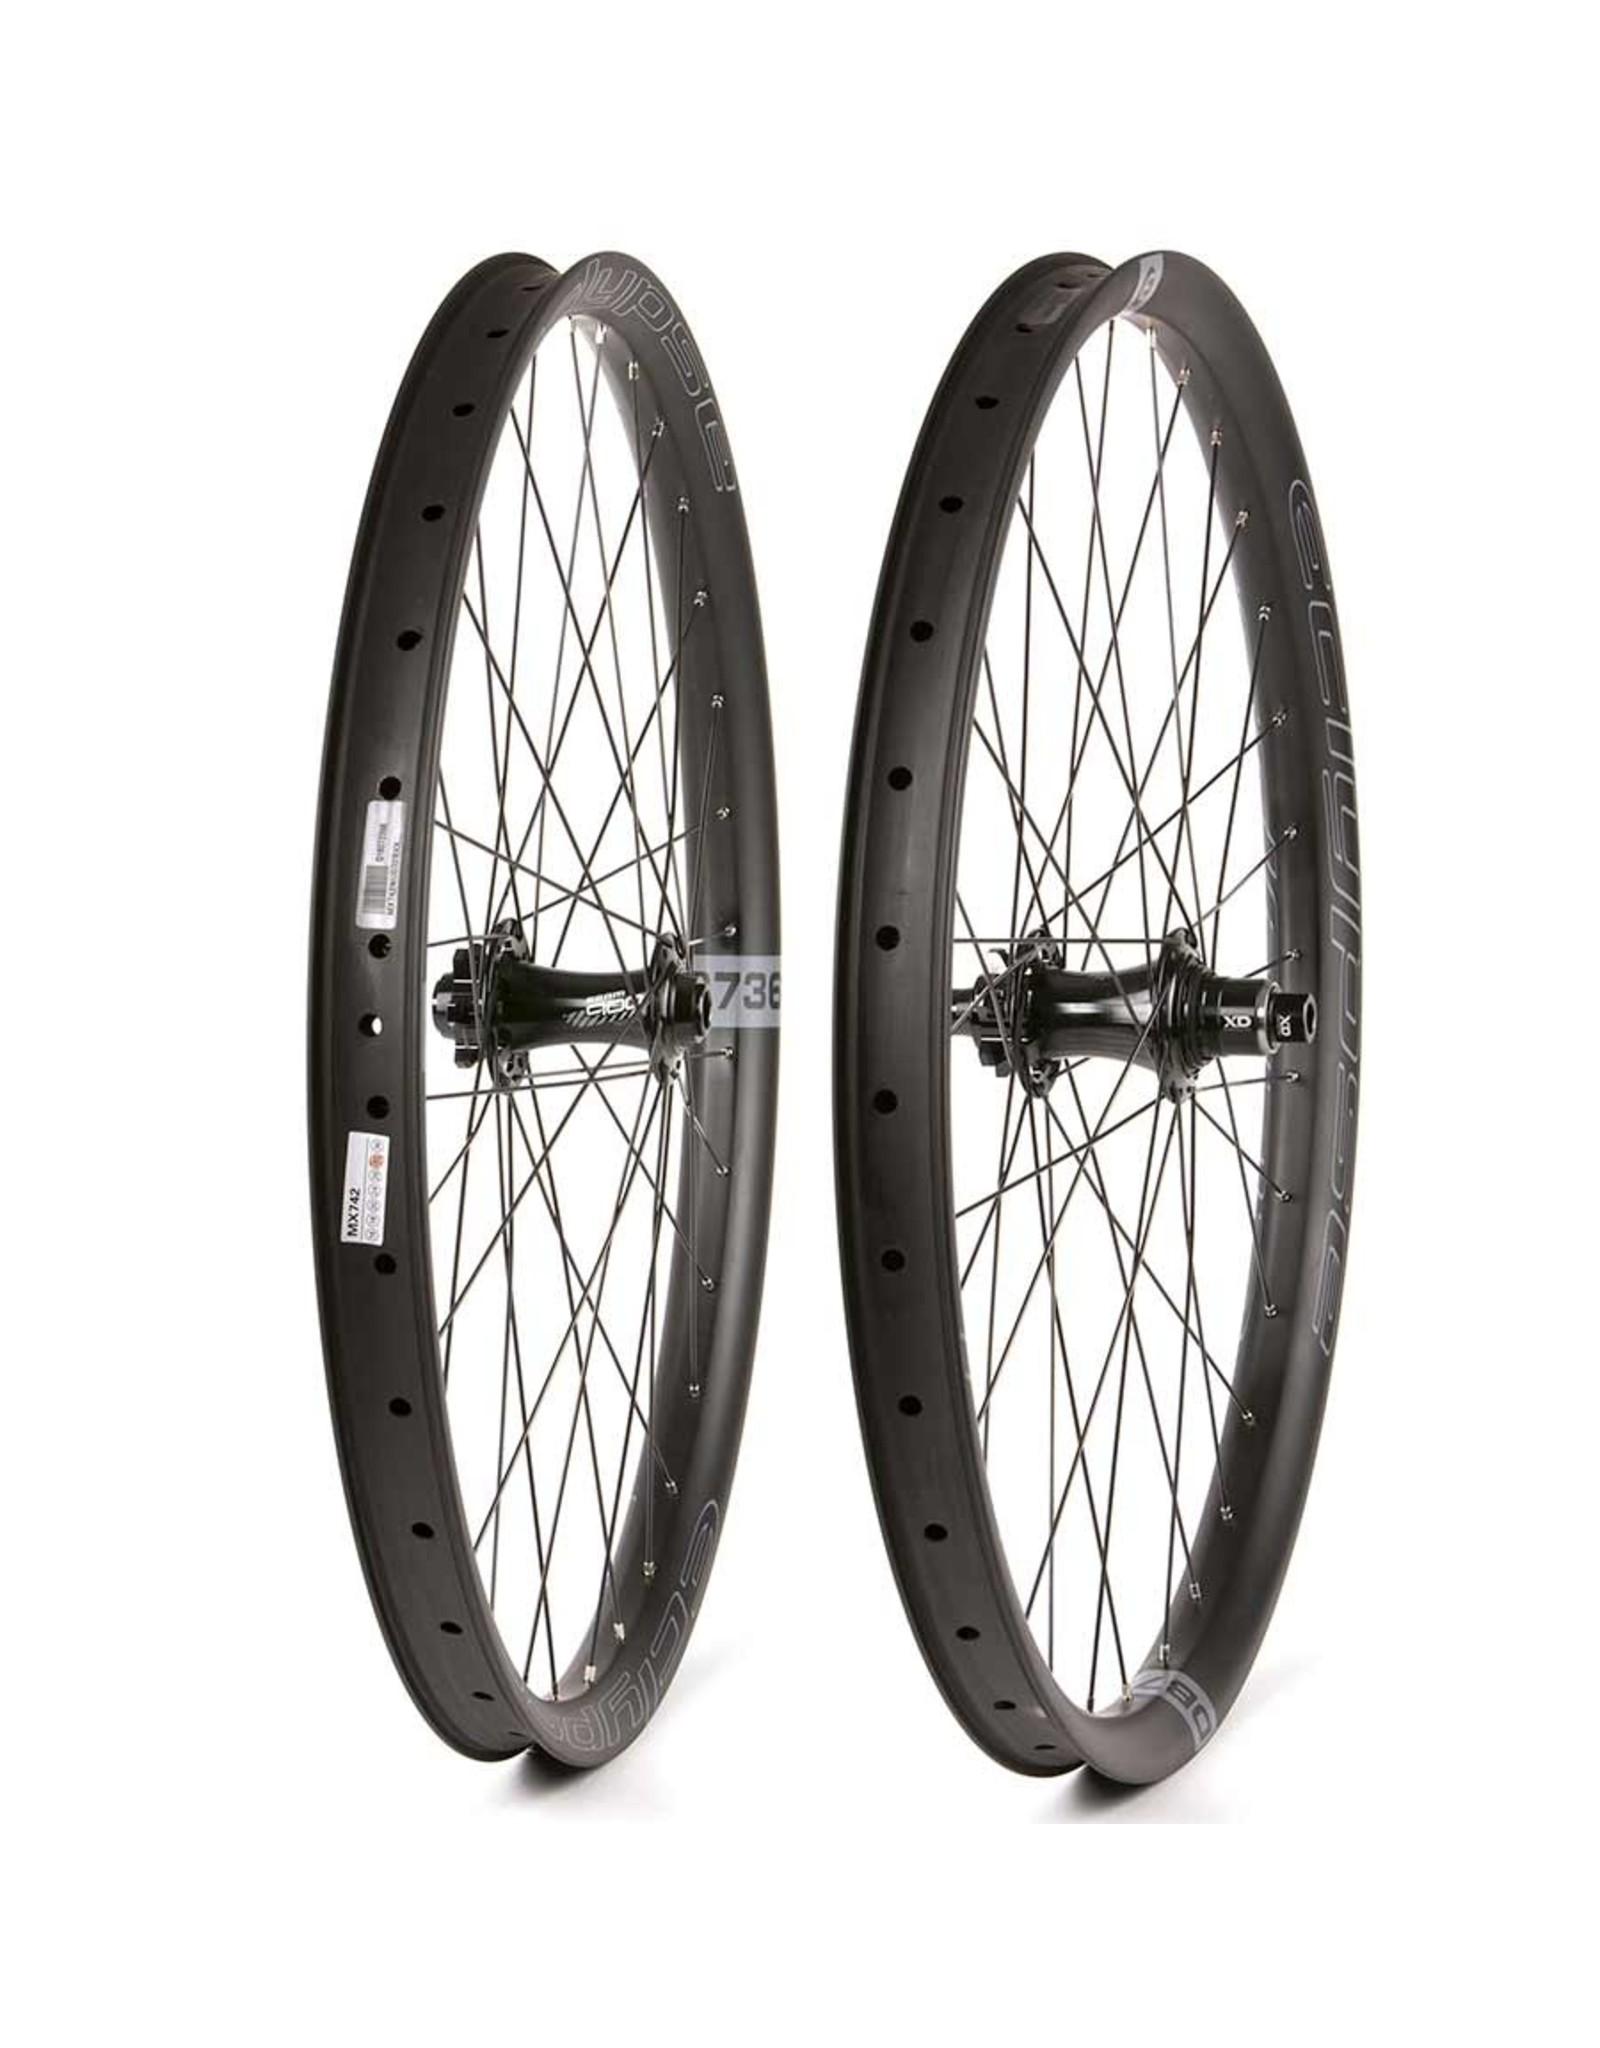 Eclypse Eclypse, DB736 Wide Trail Boost XD, Wheel, Front and Rear, 27.5'' / 584, Holes: F: 32, R: 32, F: 15mm, R: 12mm, F: 110, R: 148, Disc IS 6-bolt, SRAM XD, Pair